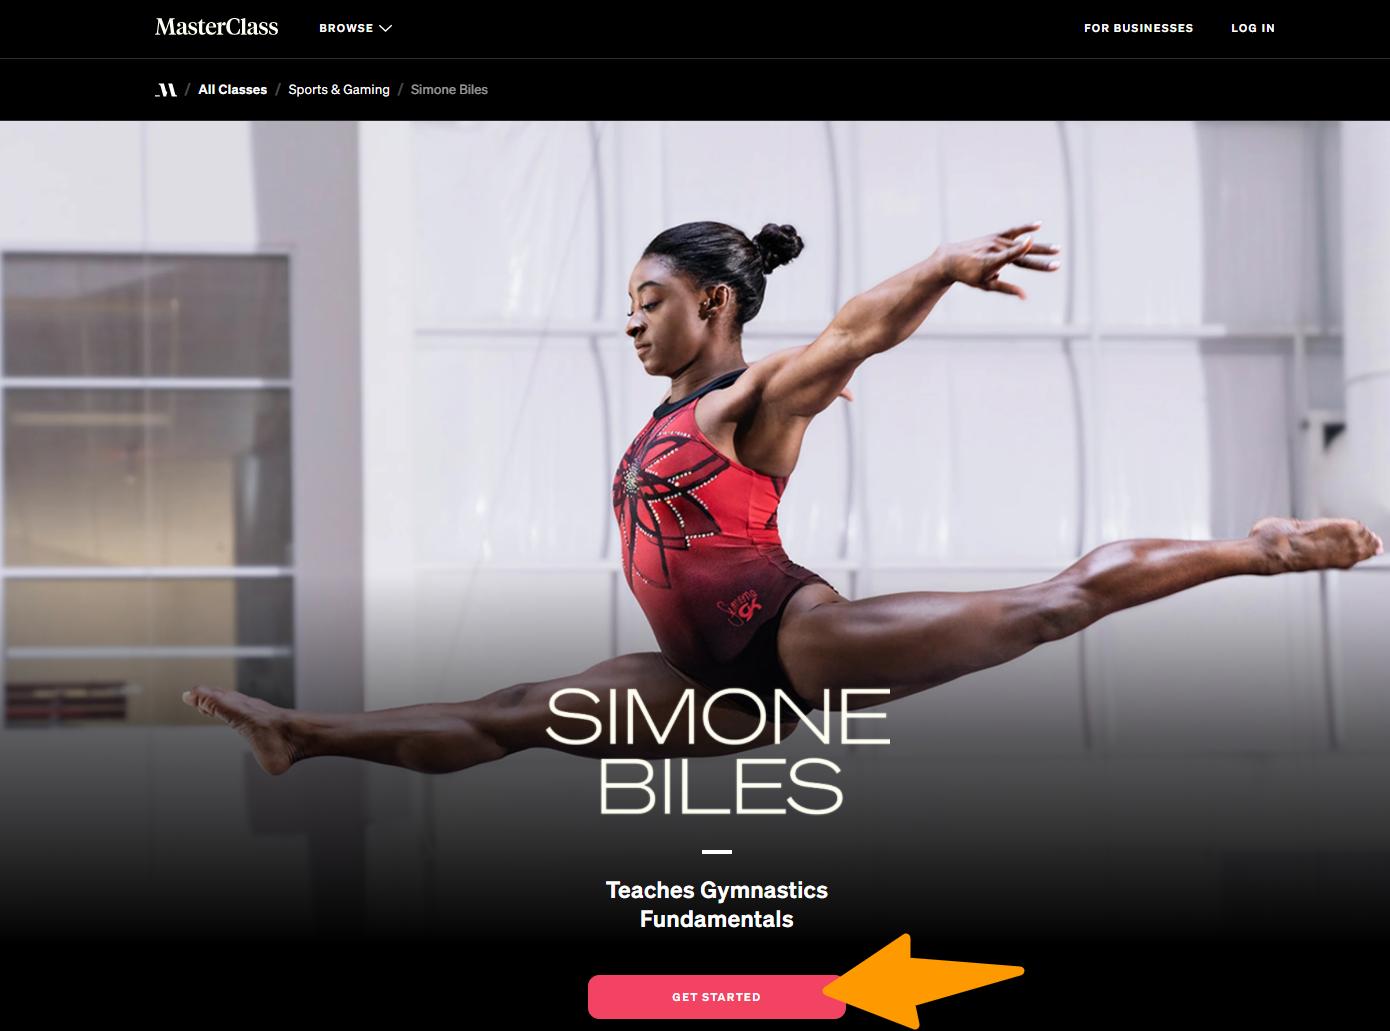 MasterClass-Simone-Biles-Teaches-Gymnastics